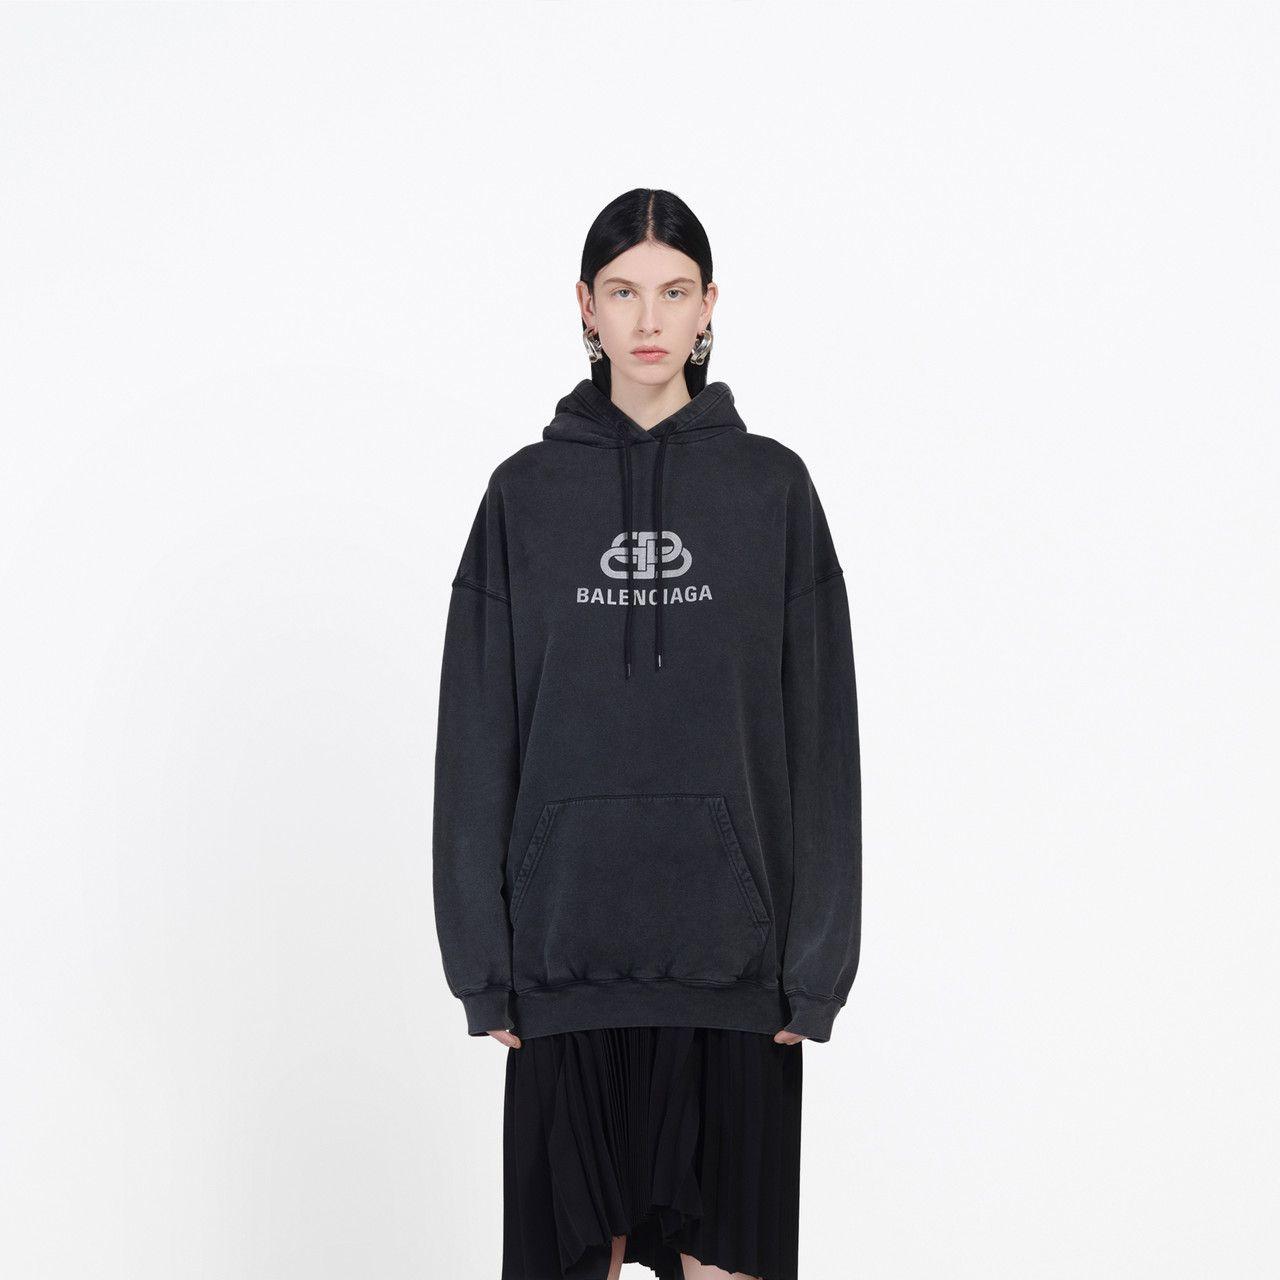 Bb Hoodie Anthracite For Women Balenciaga Sweatshirt Shirt Sweatshirts Balenciaga T Shirt [ 1280 x 1280 Pixel ]